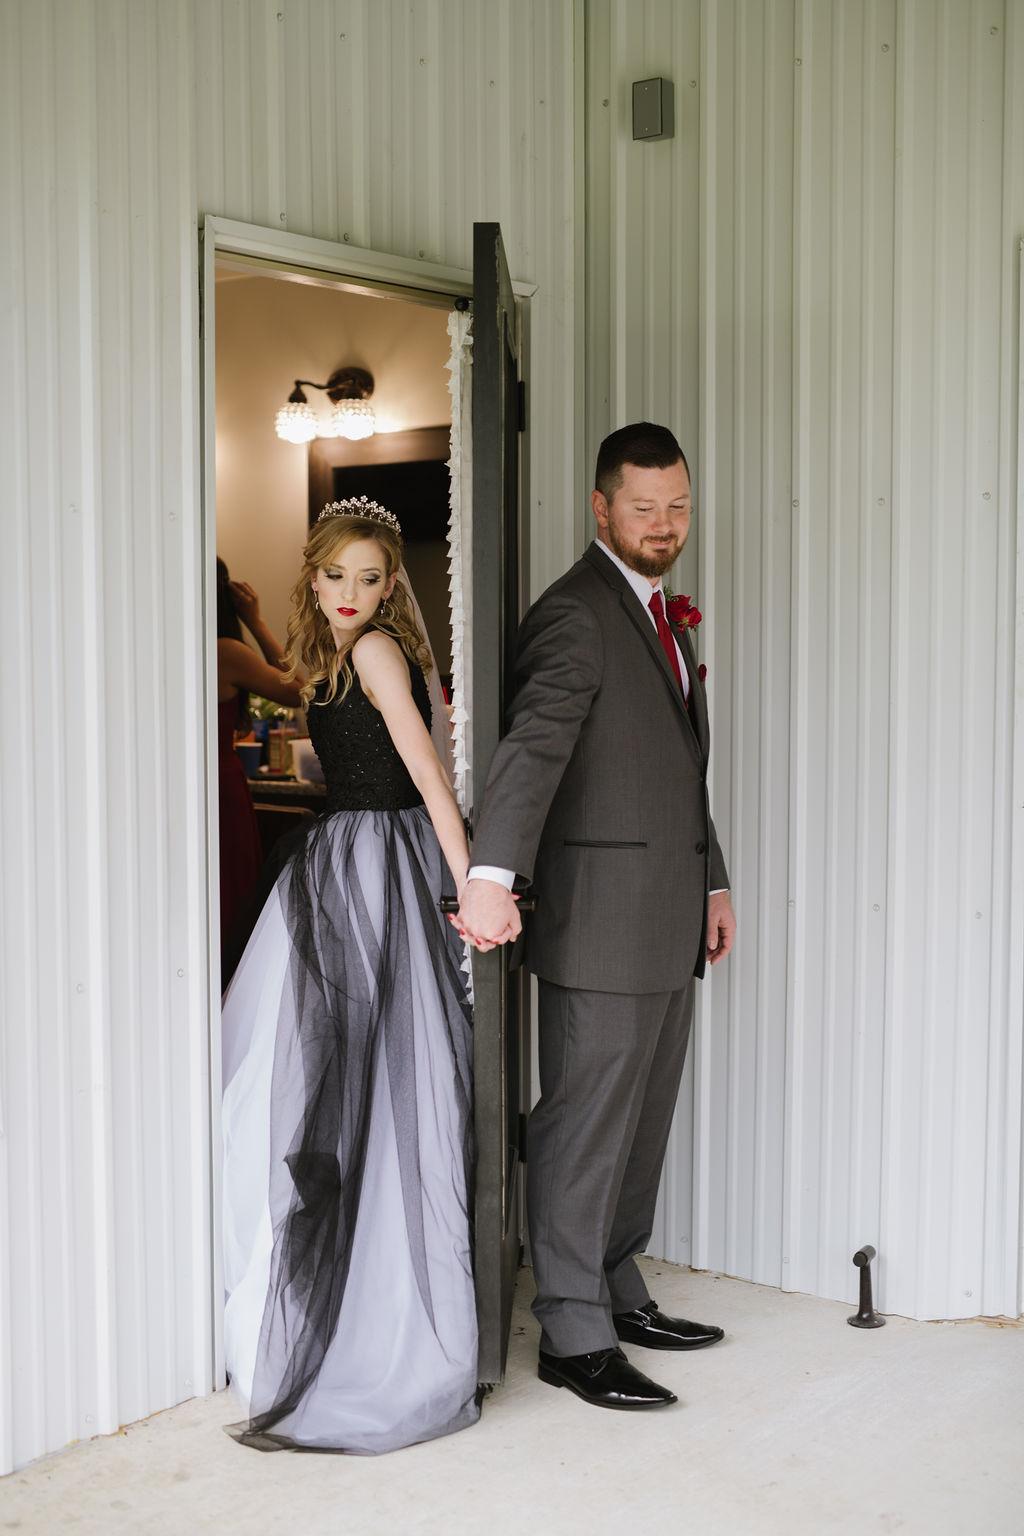 Dream Point Ranch Tulsa White Barn Wedding Venue 9.jpg